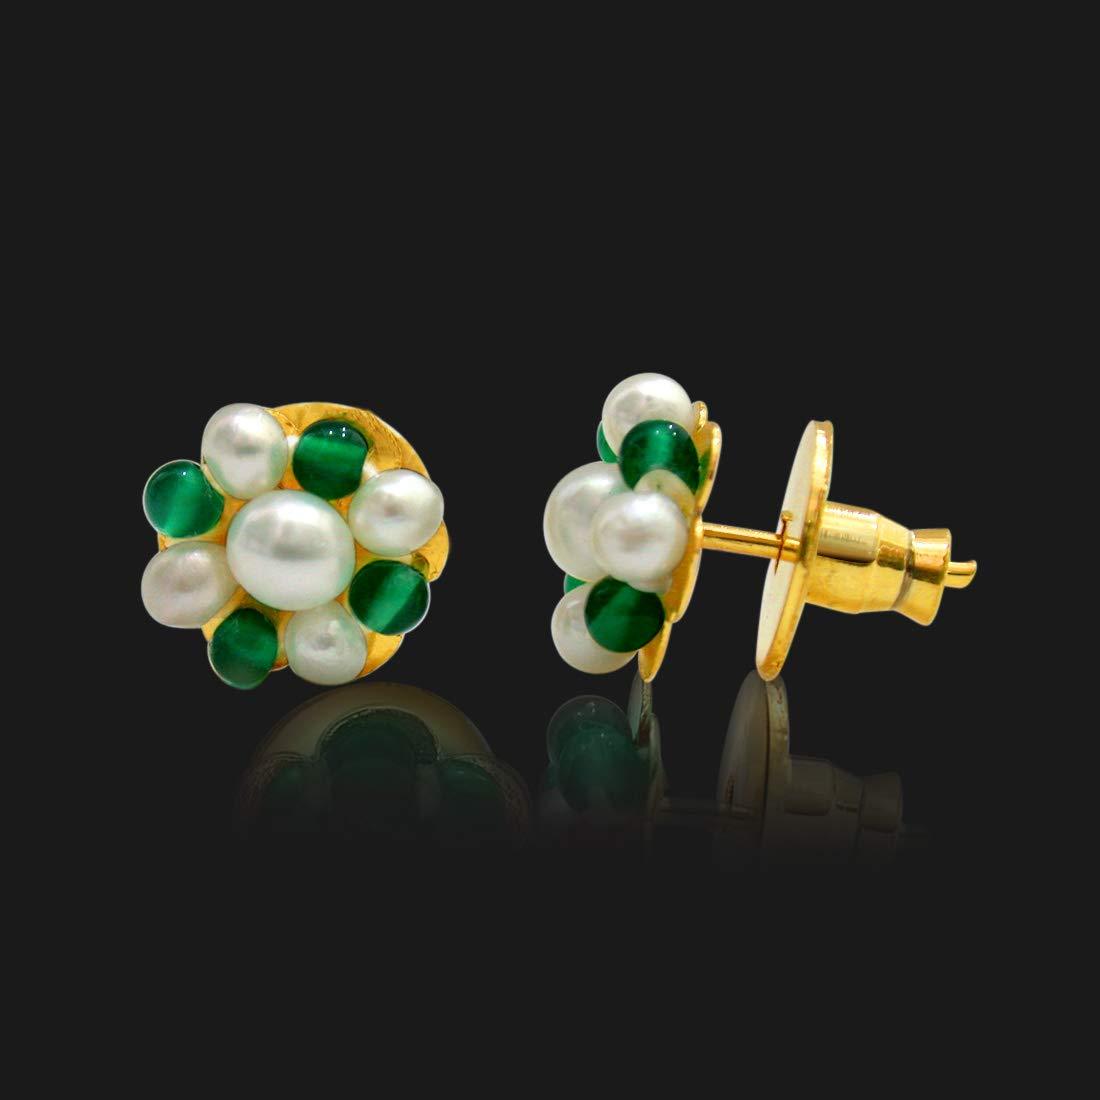 Real Freshwater Pearl & Green Onyx Beads Kuda Jodi Earrings for Women (SE110)